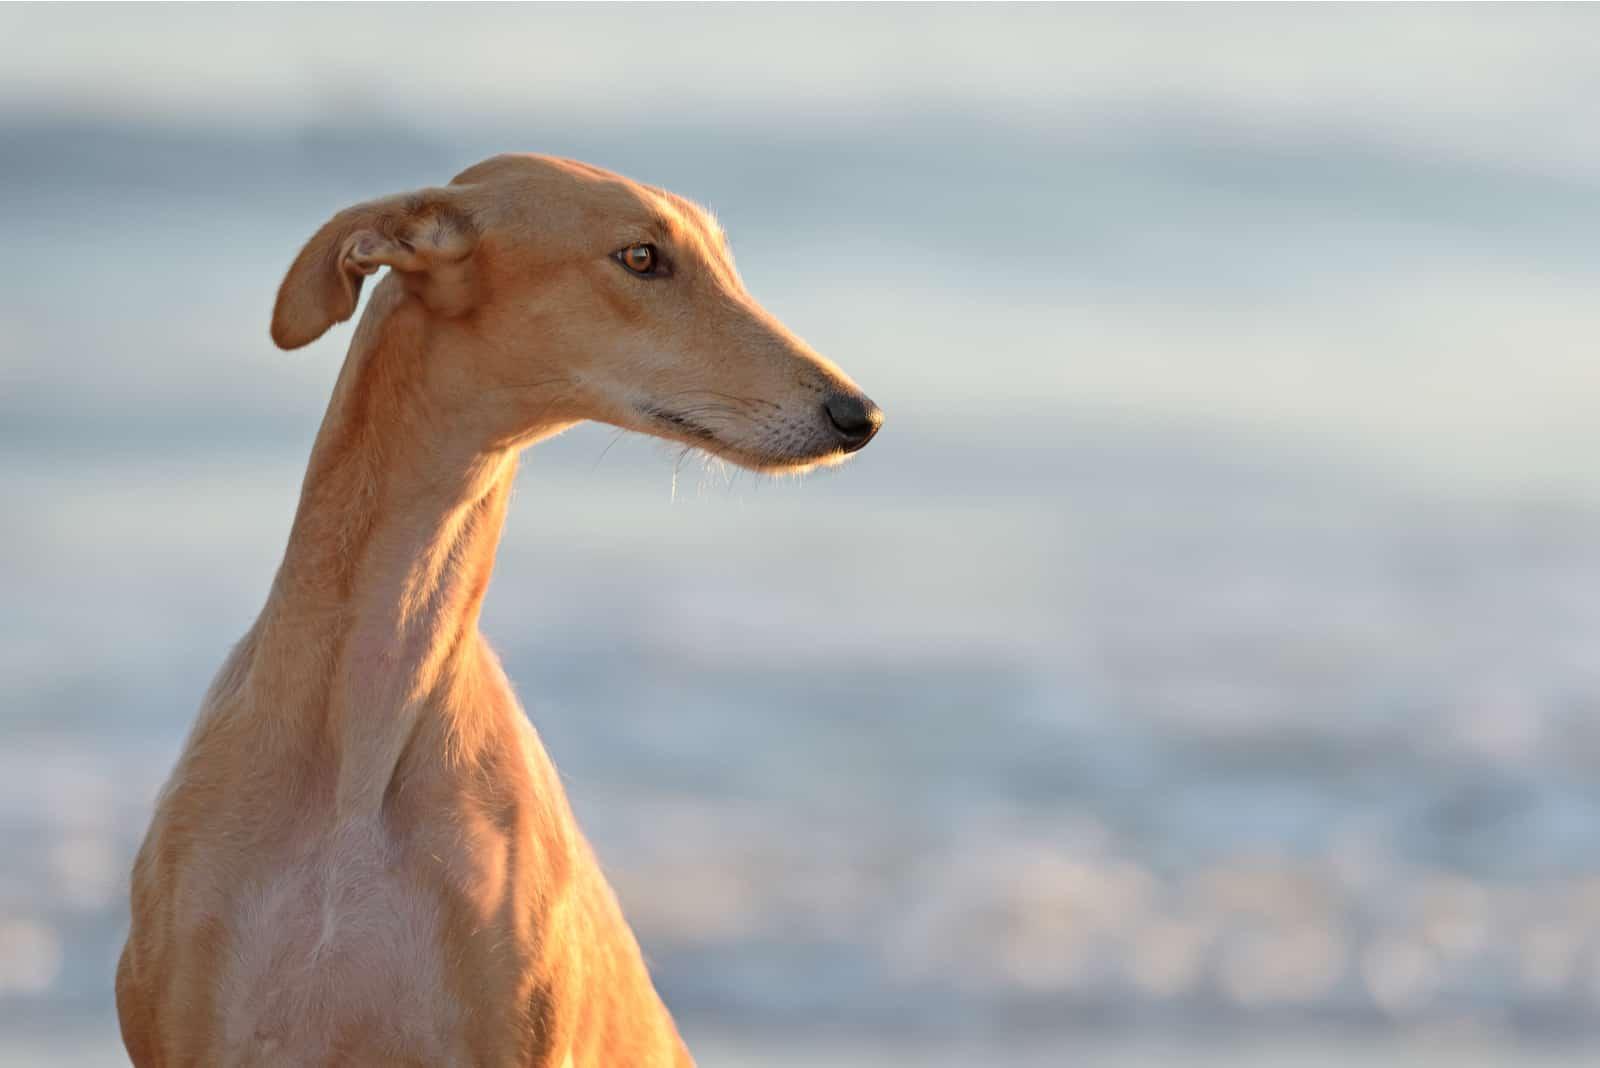 Spanish Greyhound dog outdoors at the beach